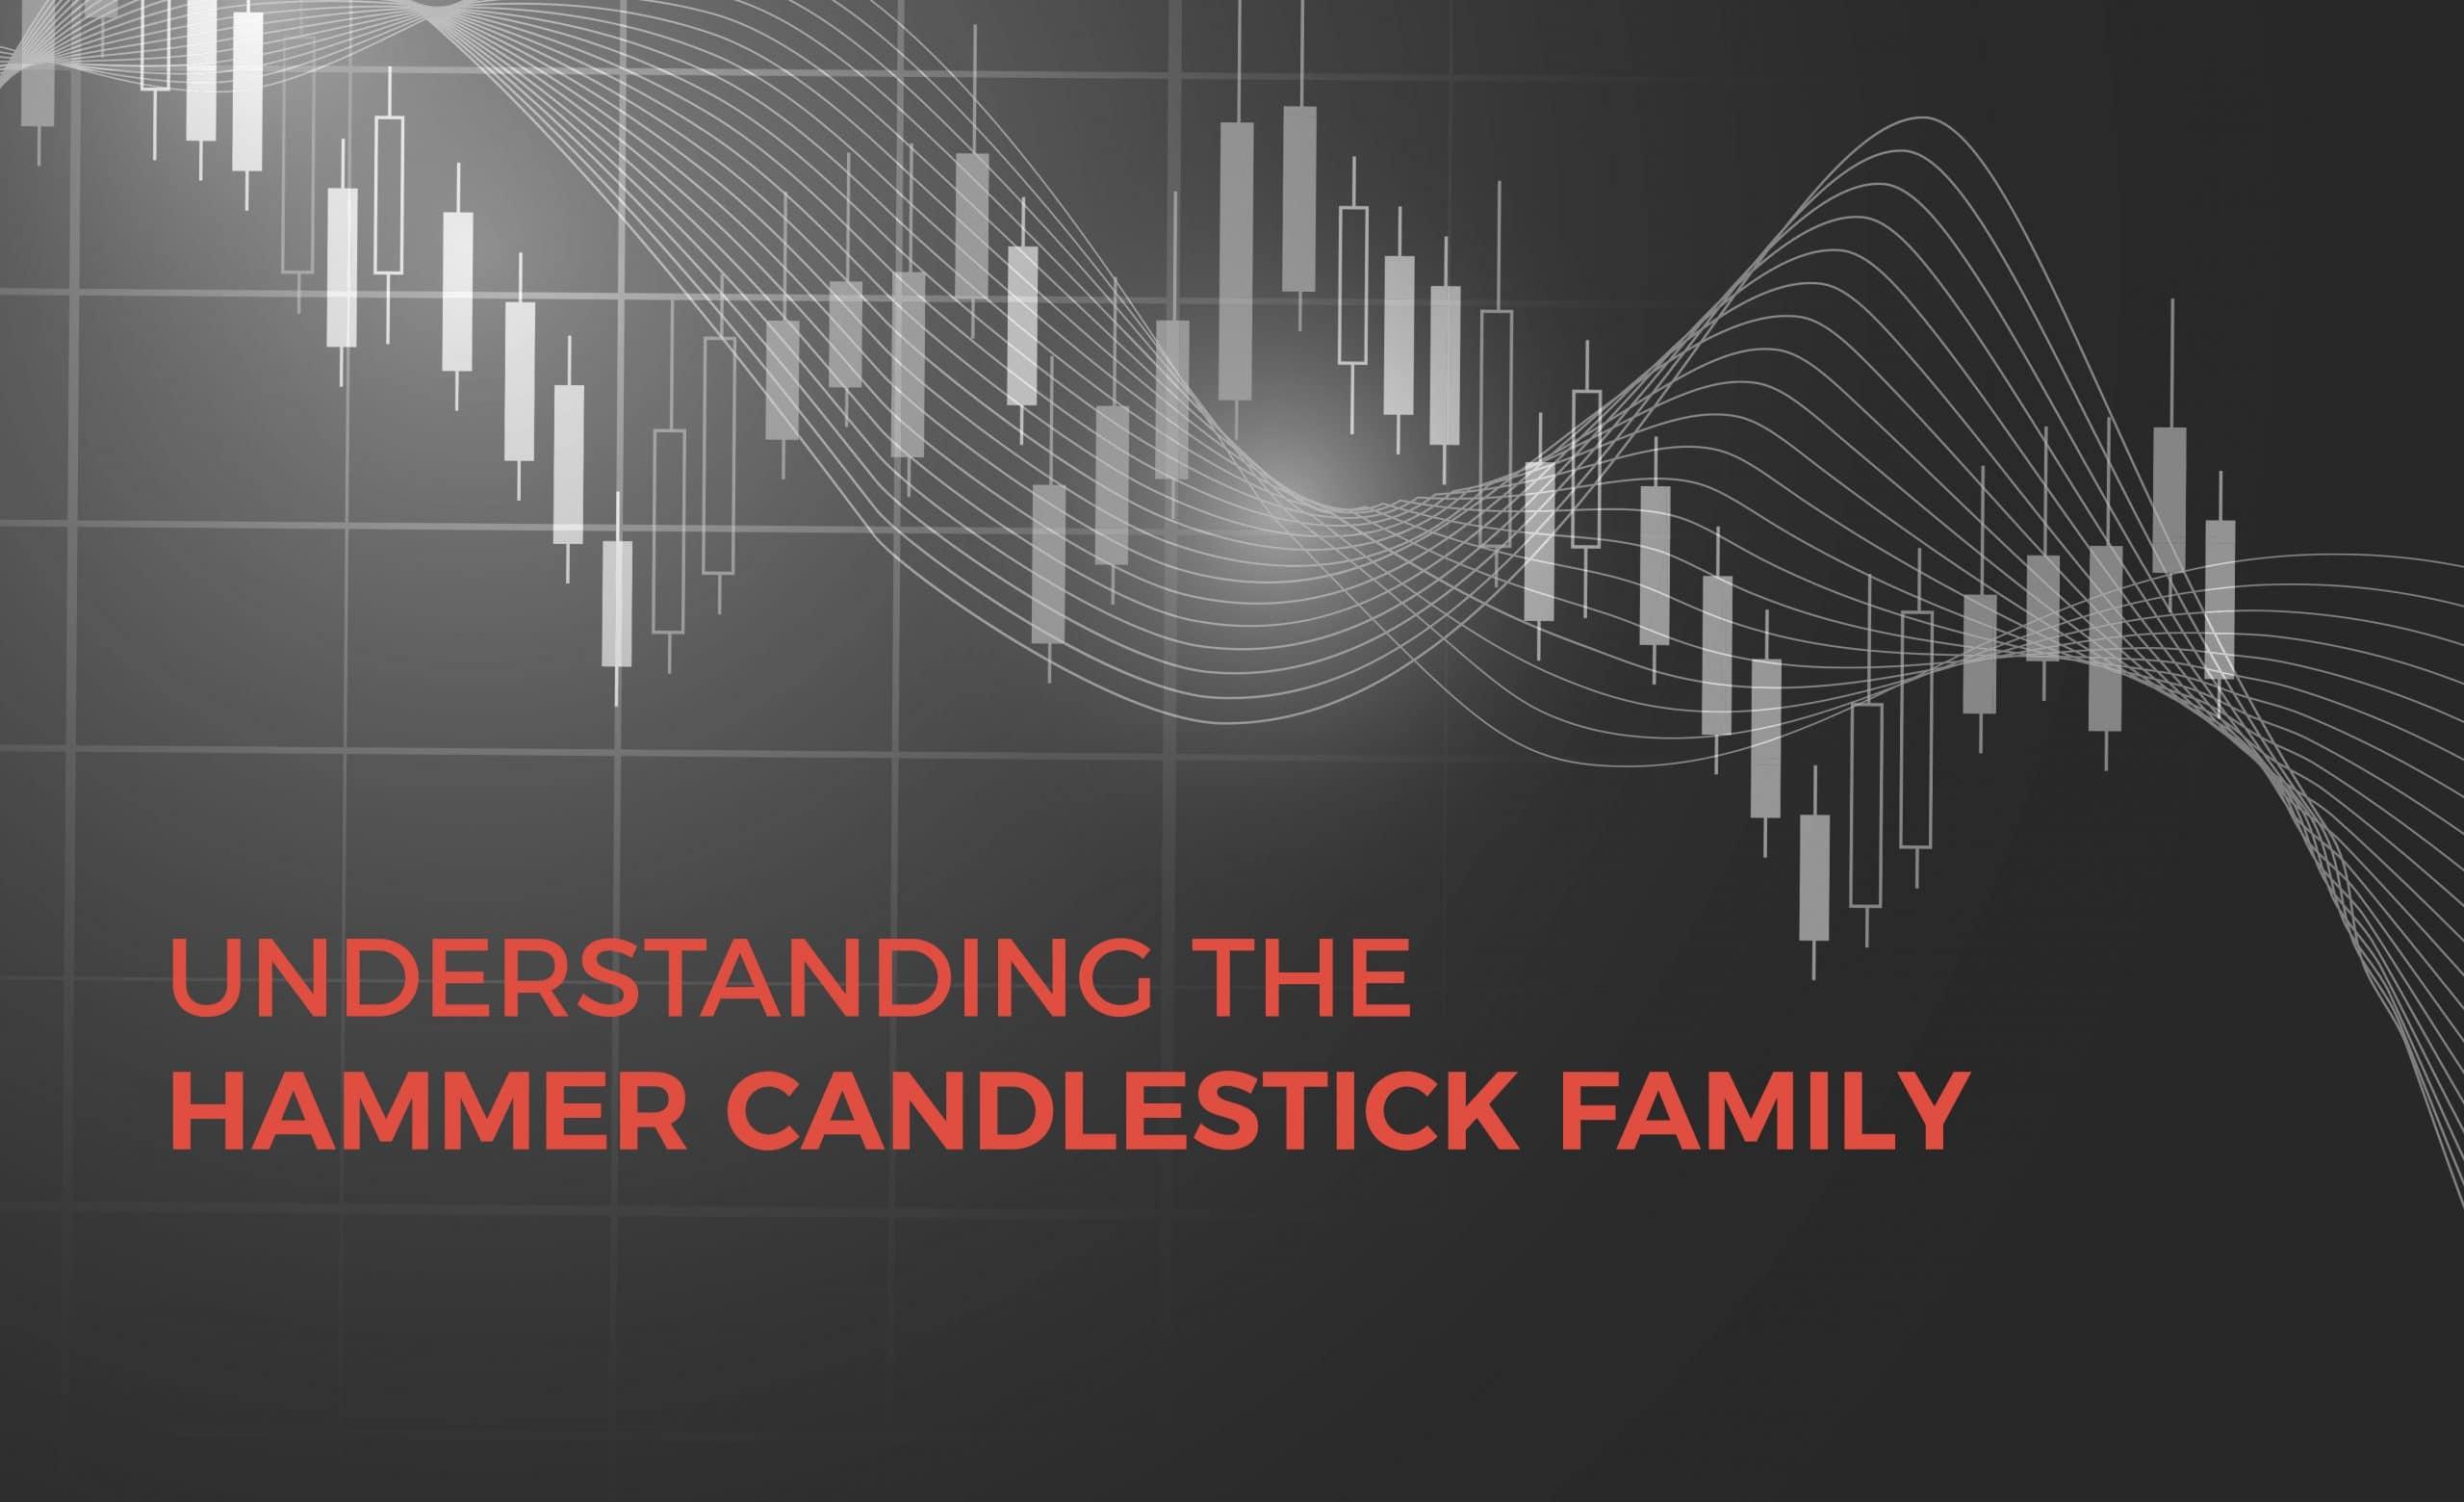 Understanding the Hammer Candlestick Family